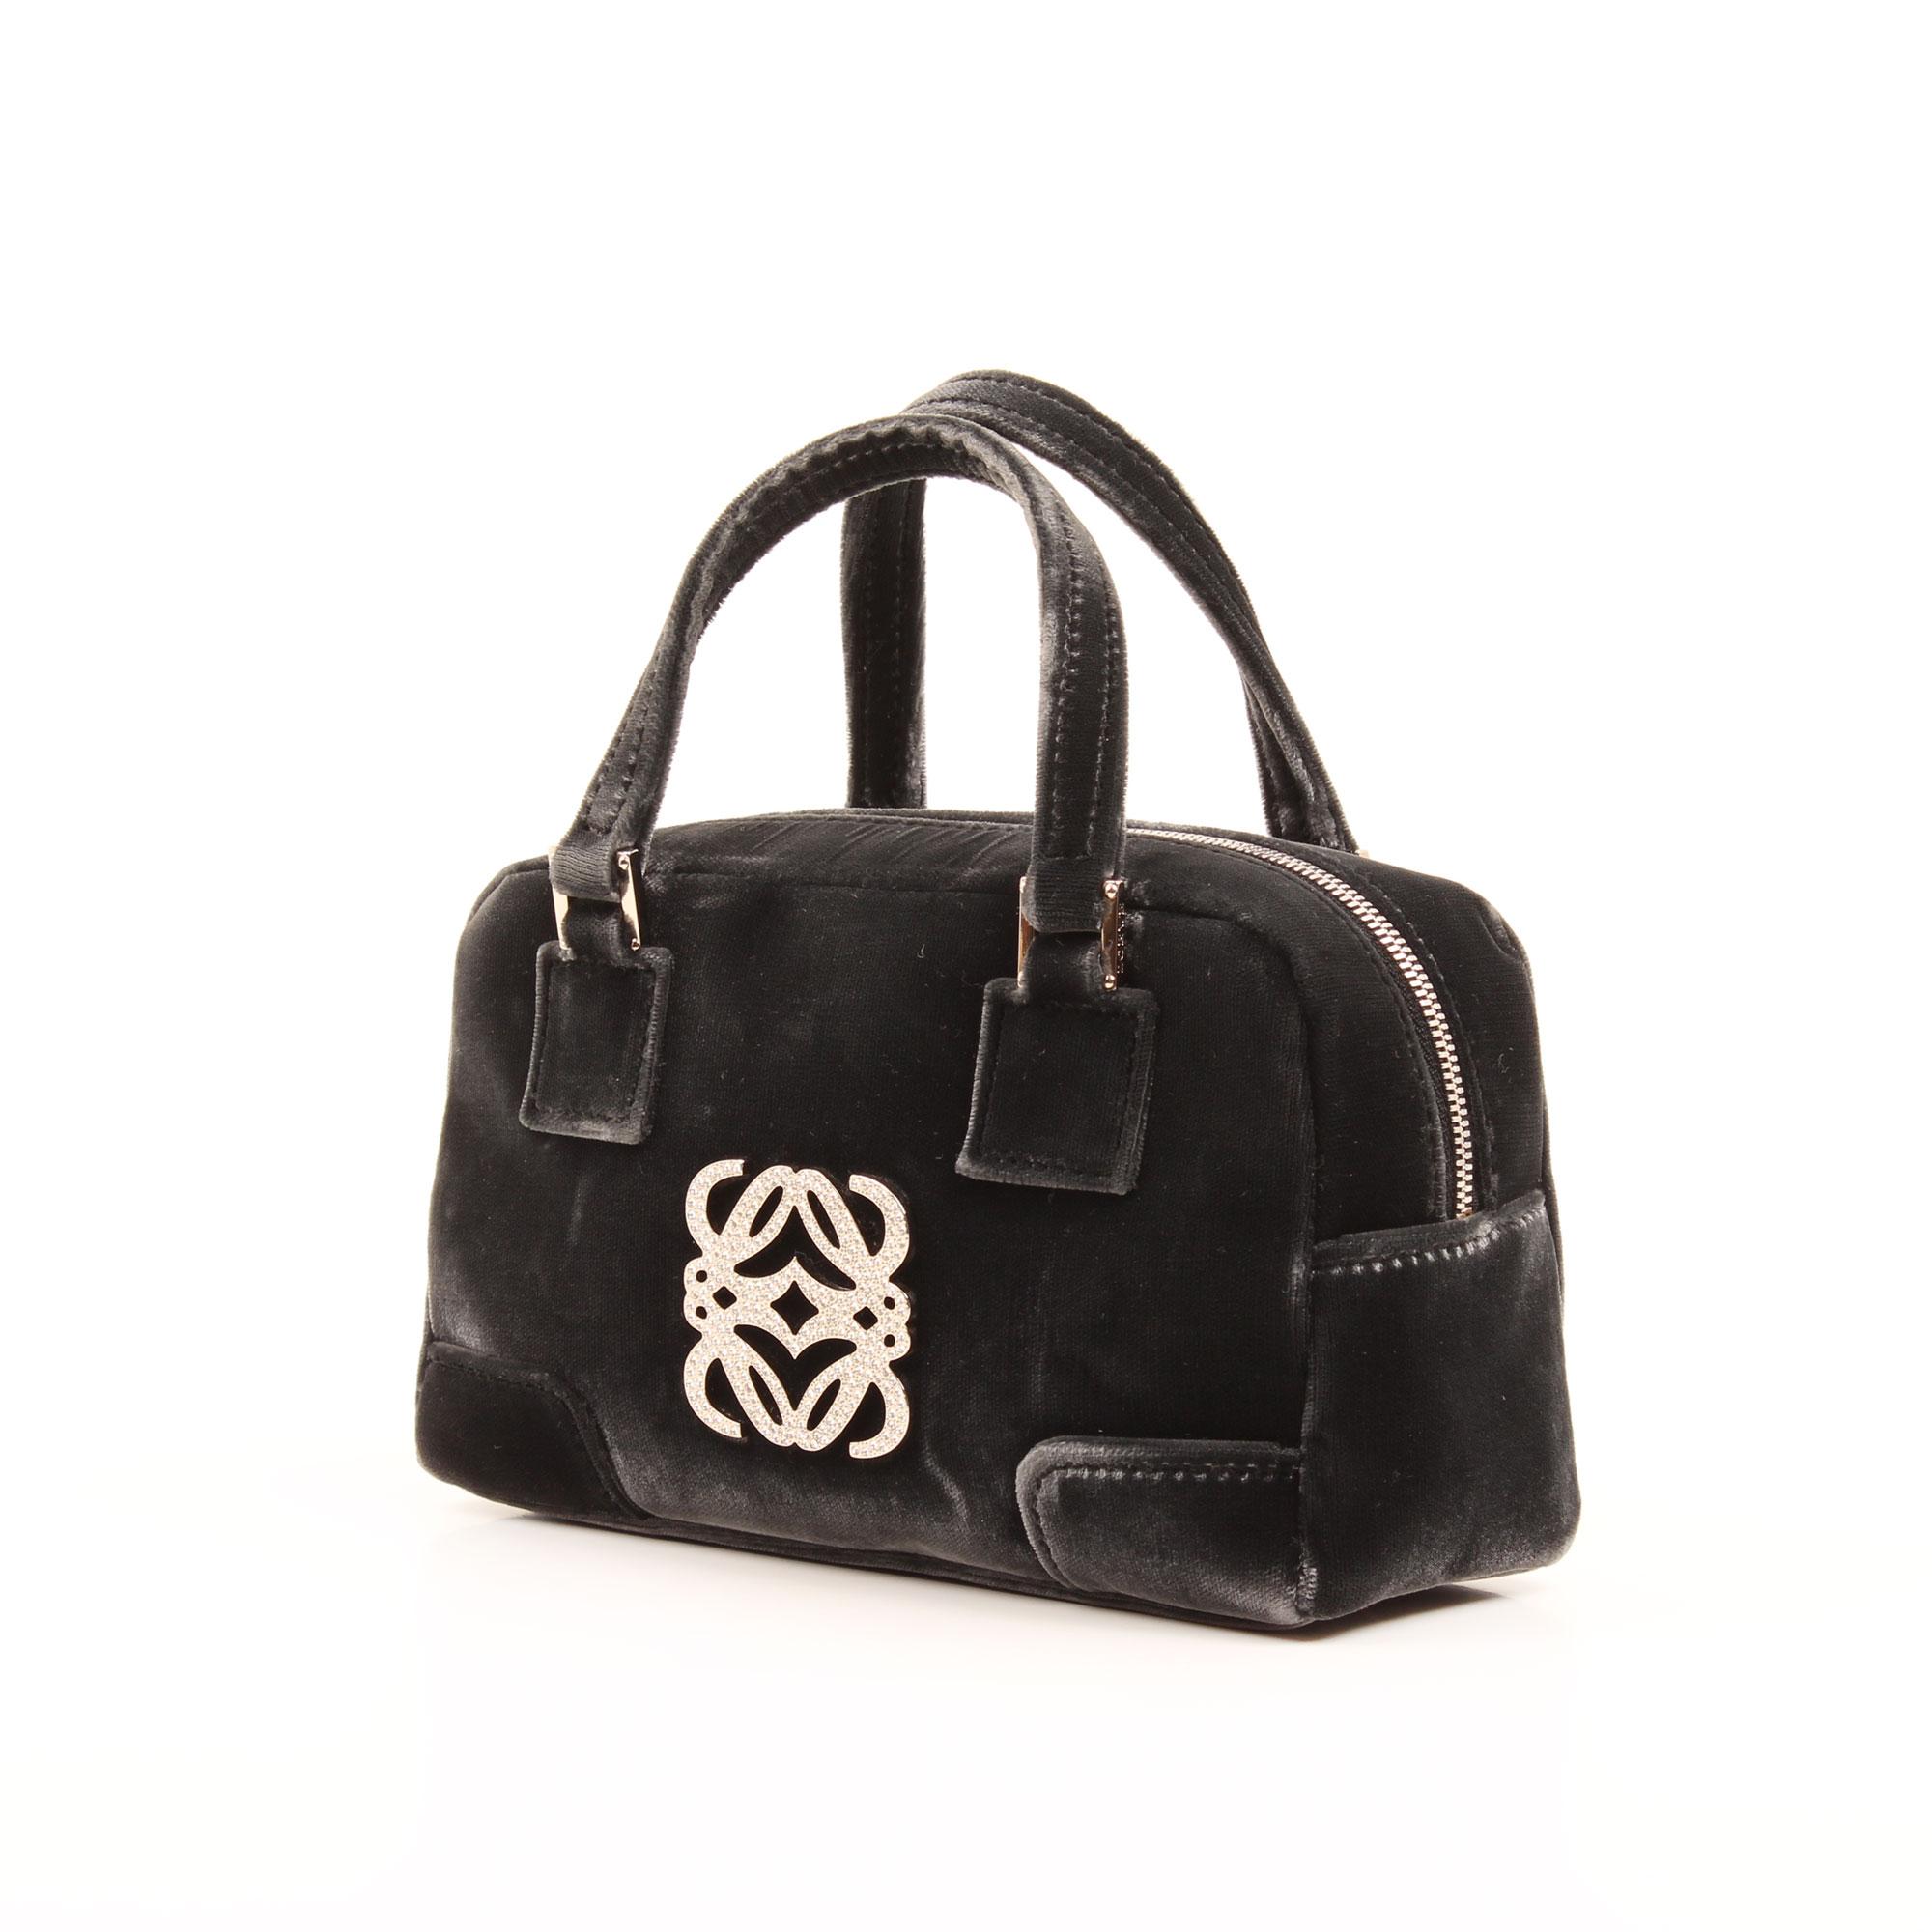 Imagen general del bolso de mano loewe amazona bb negro terciopelo